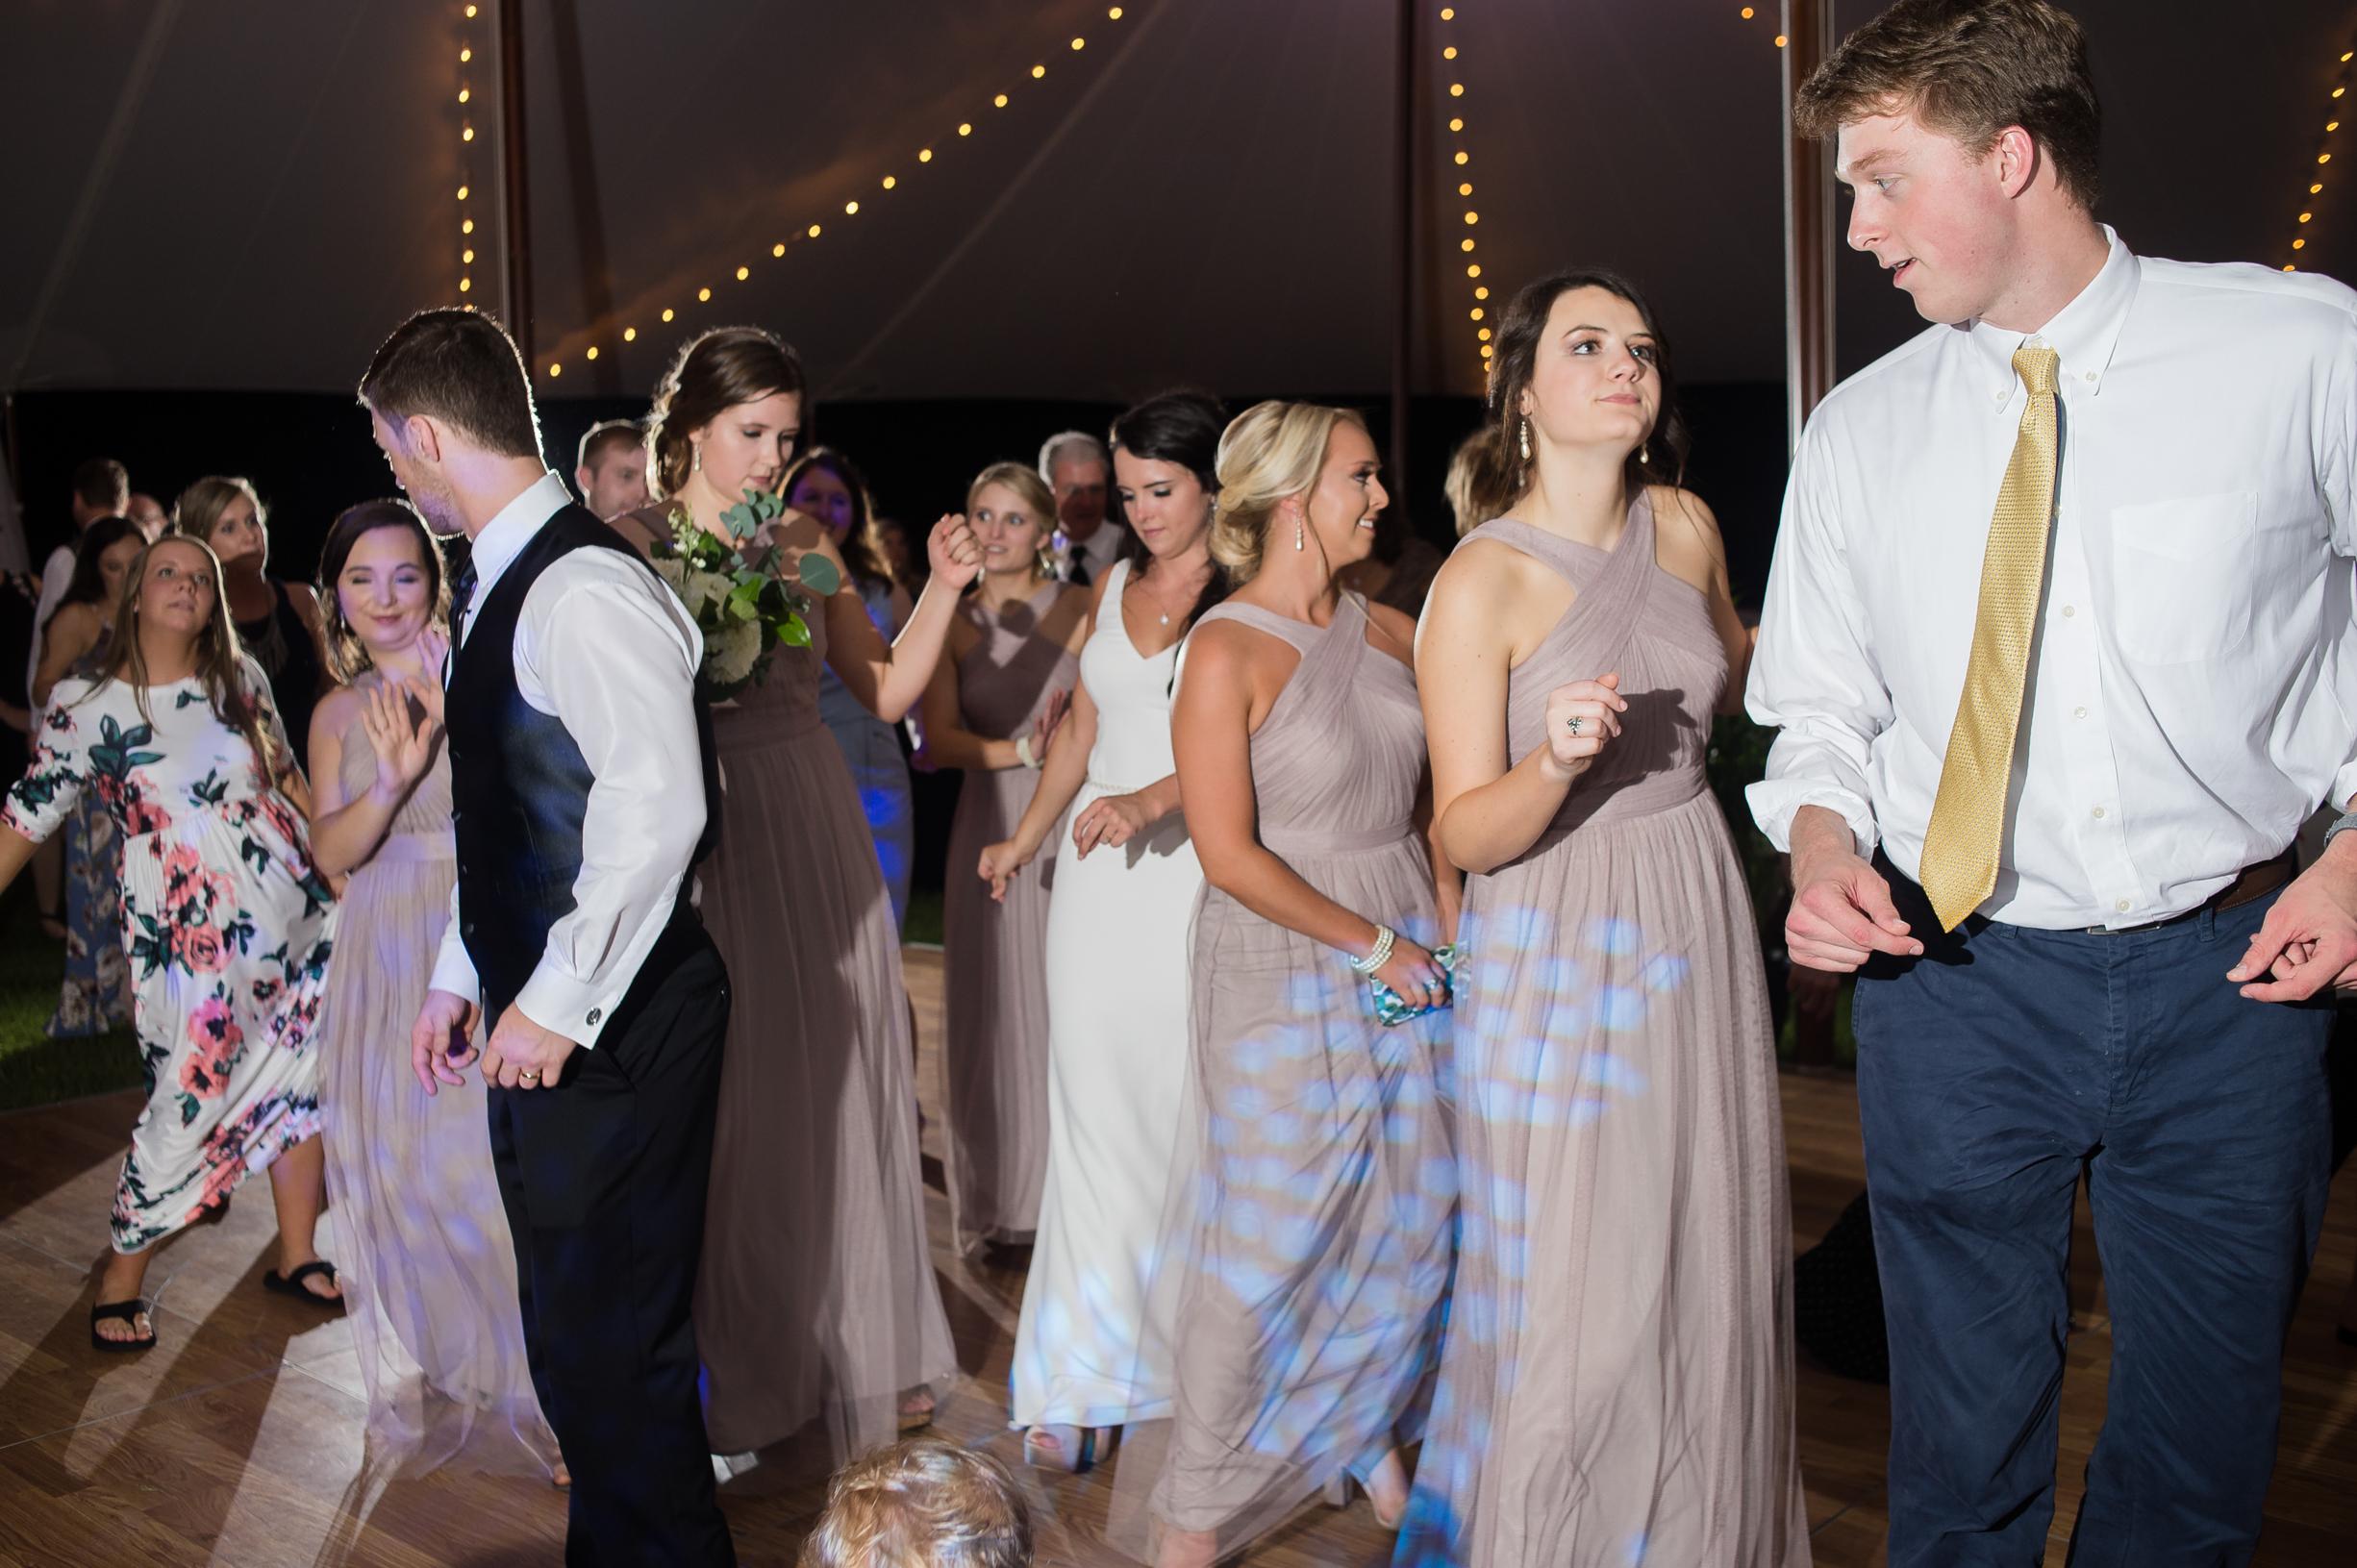 Royal Wedding with Outdoor Reception-56.JPG